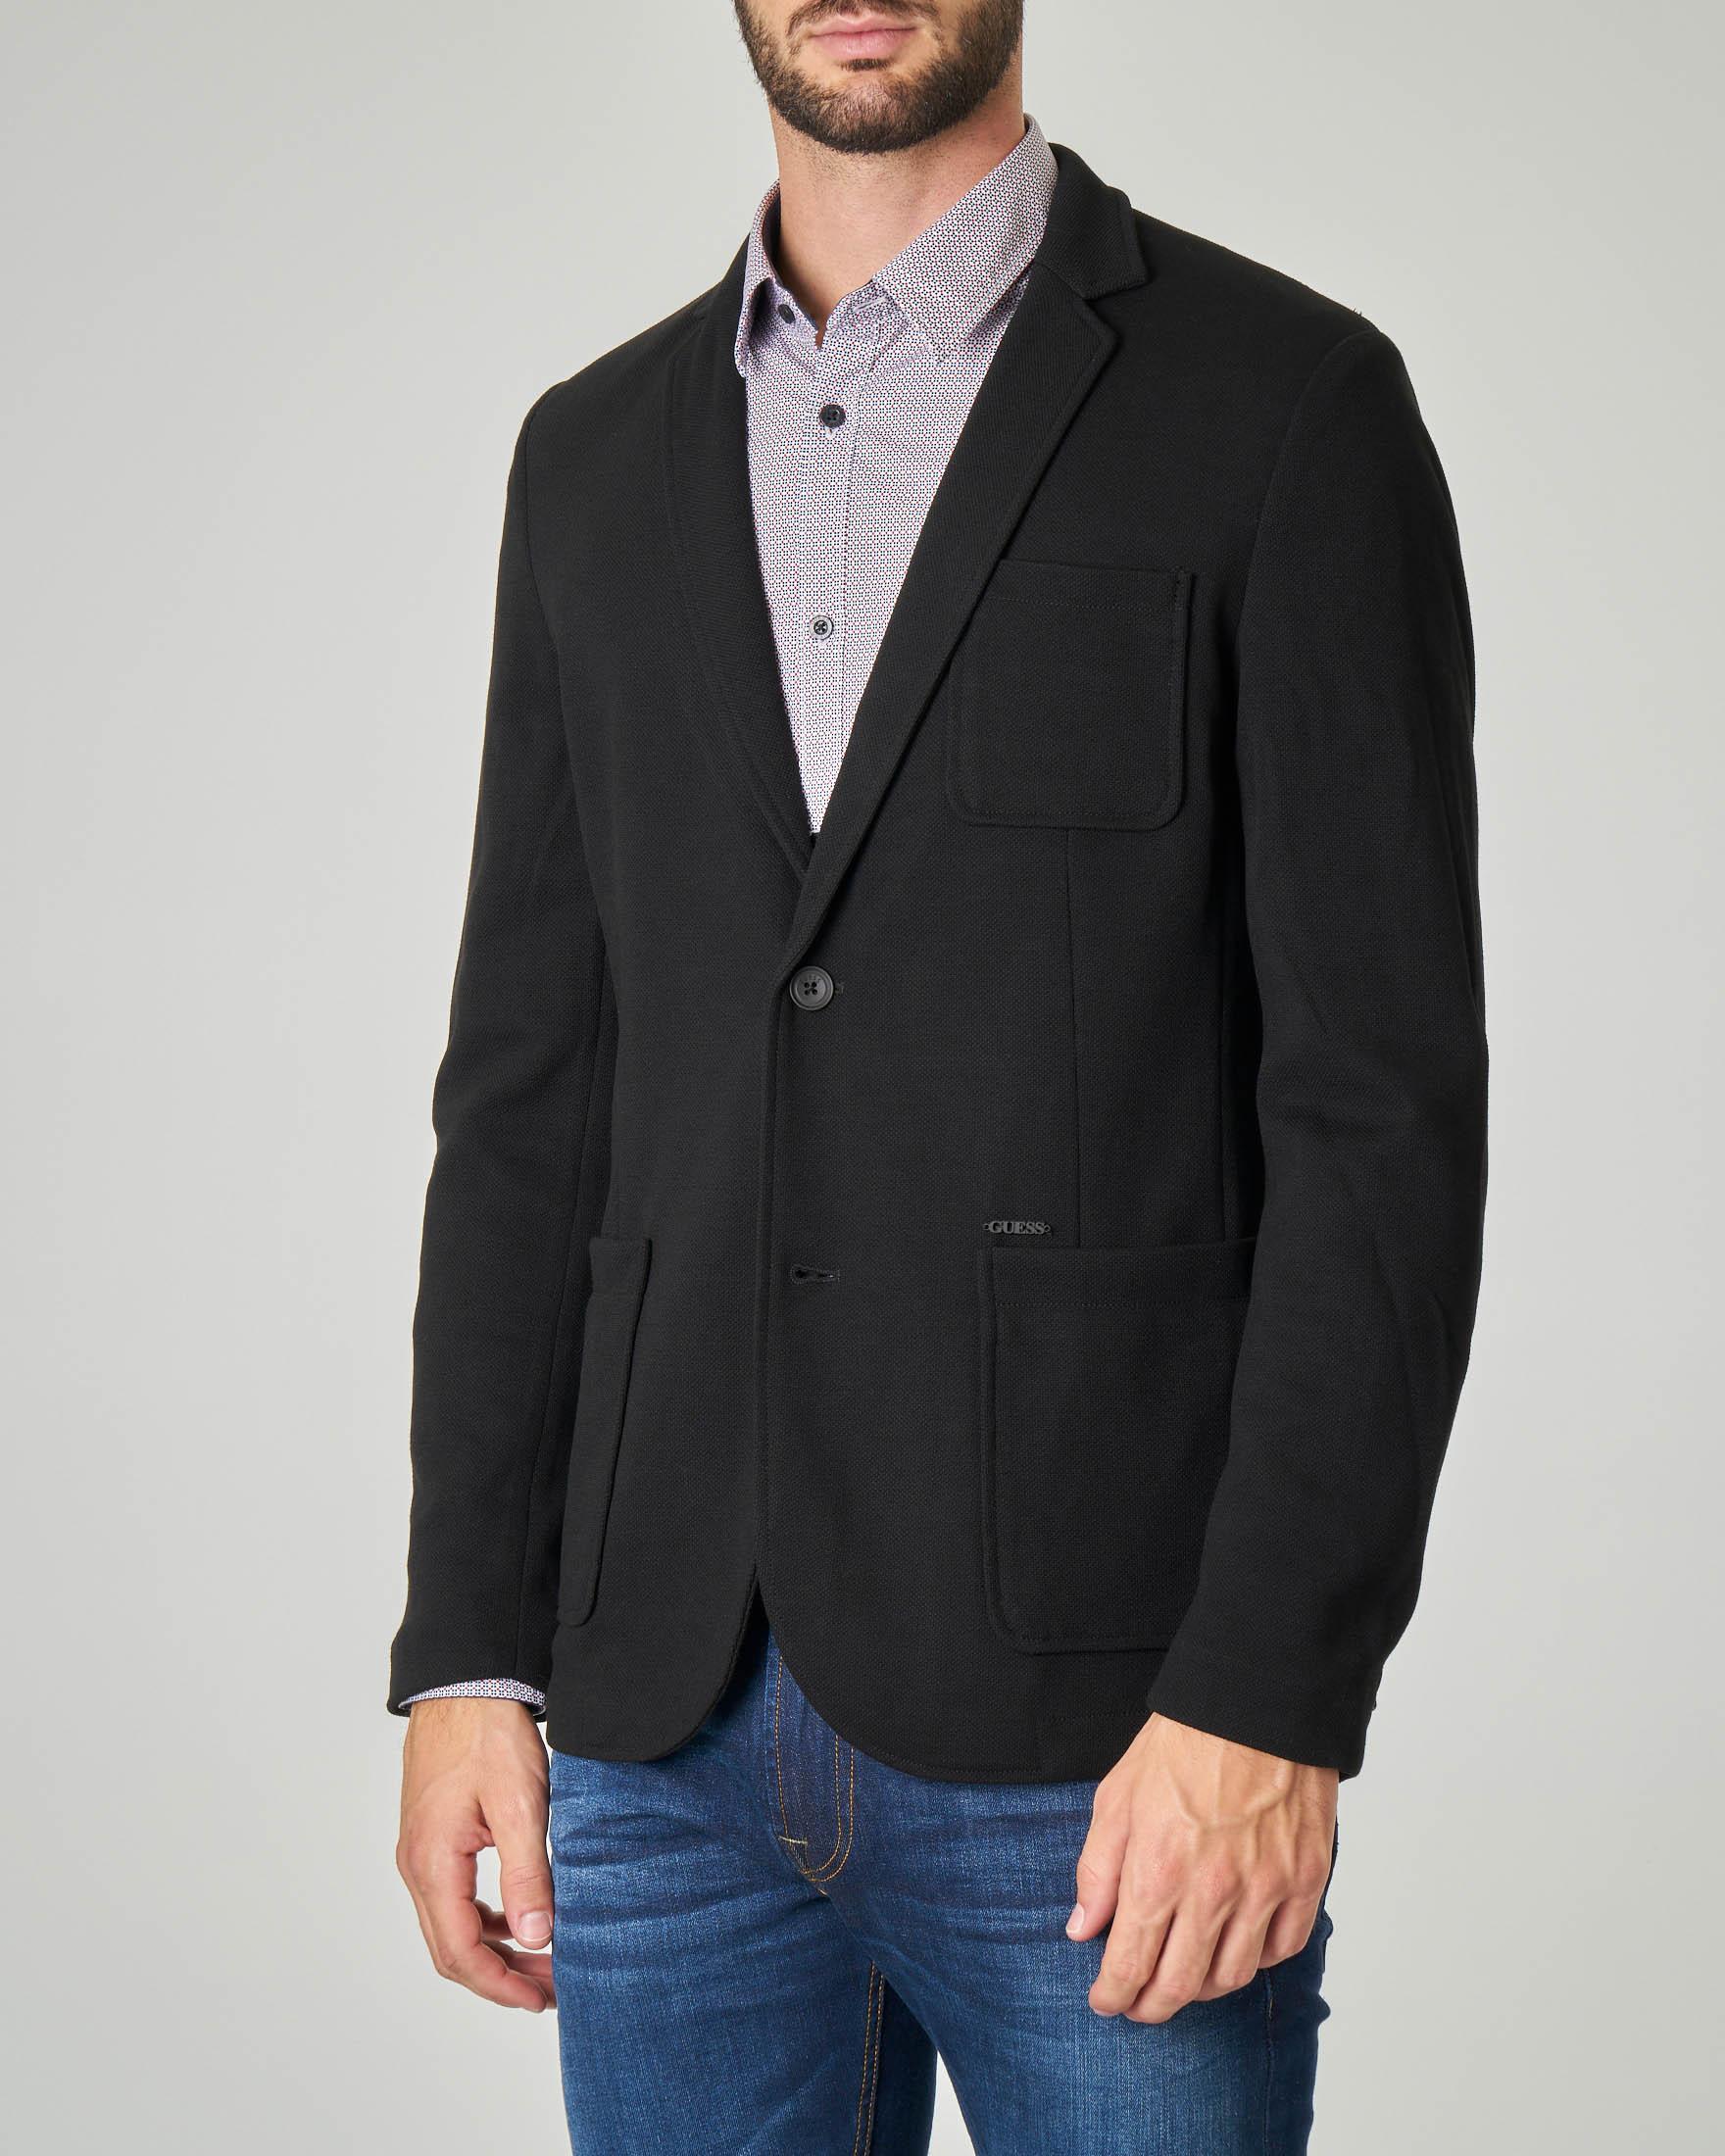 Giacca maglia nera in tessuto piquet